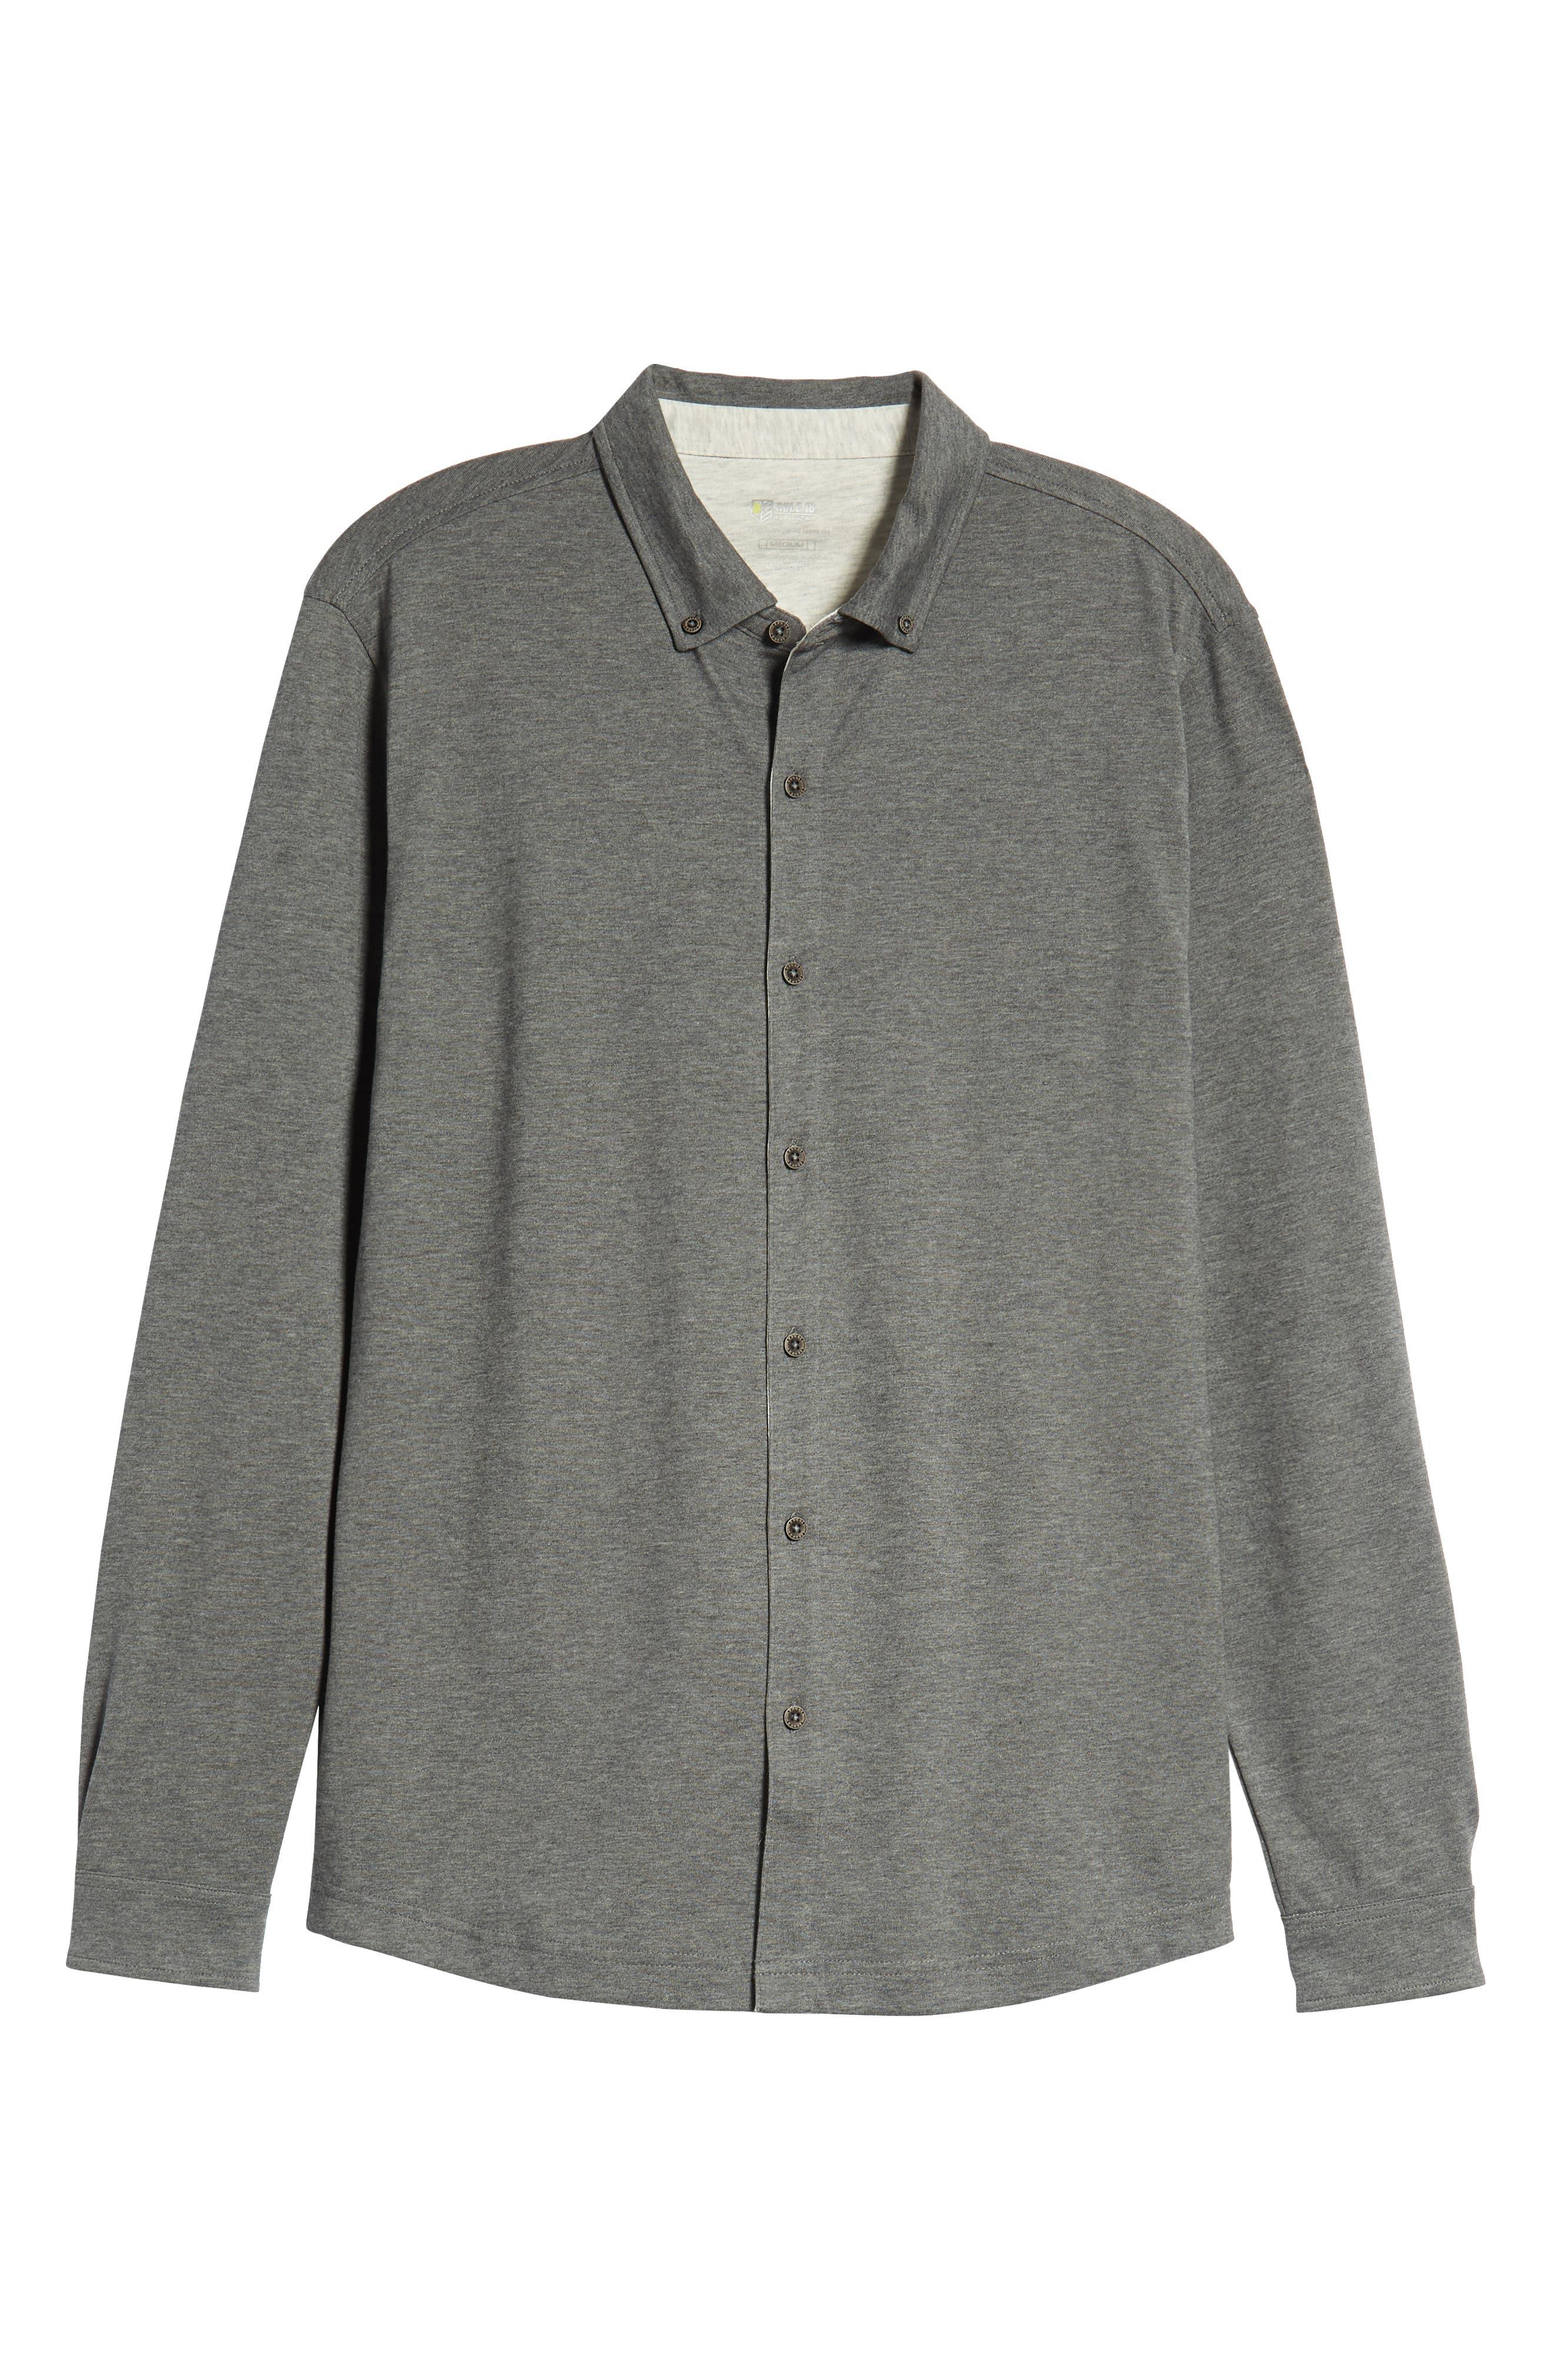 Rule 18 Brushed Regular Fit Knit Sport Shirt,                             Alternate thumbnail 6, color,                             020